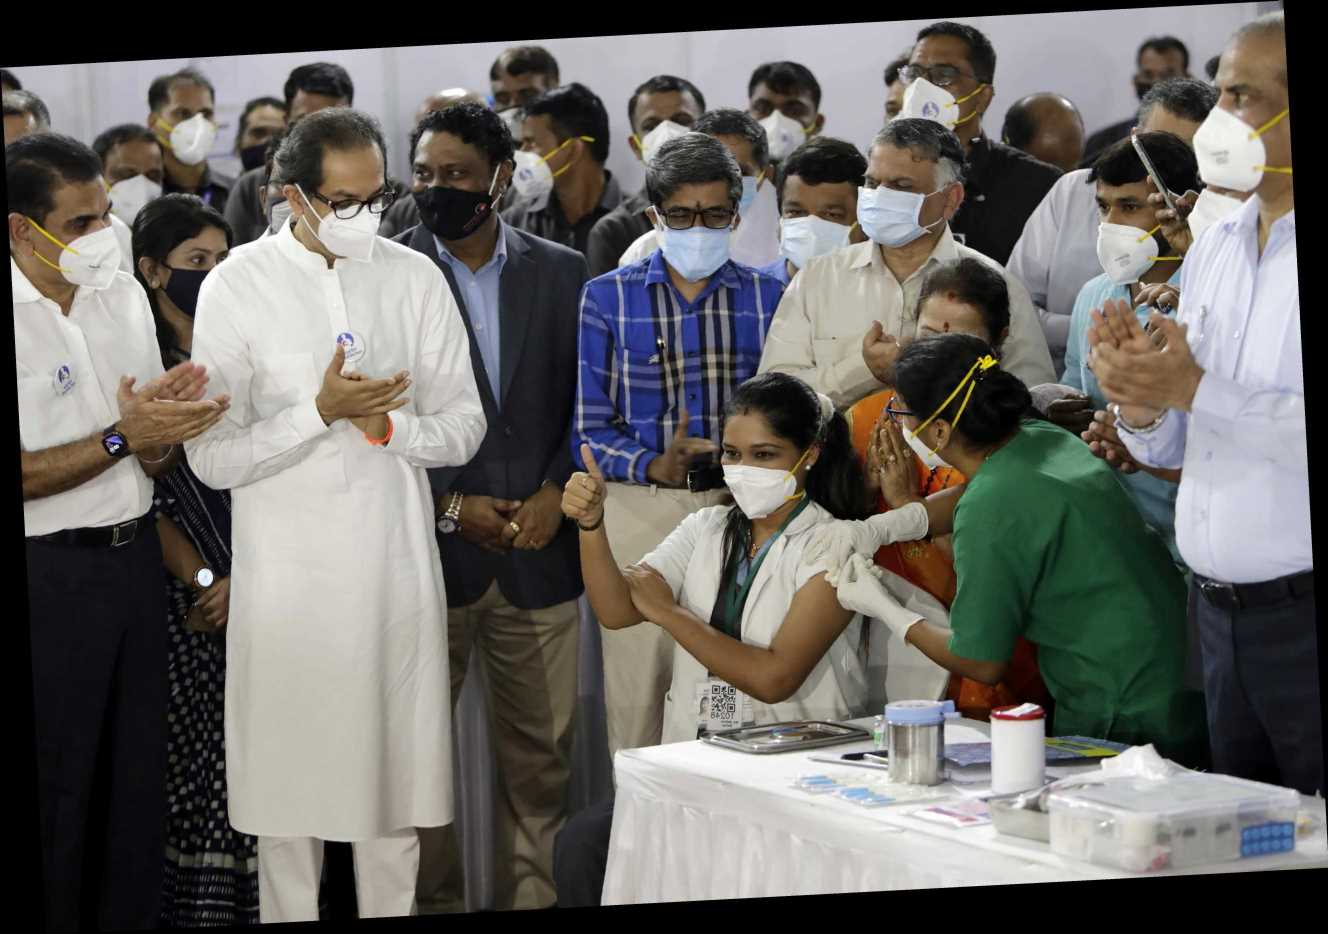 India starts 'world's biggest' COVID-19 vaccination drive